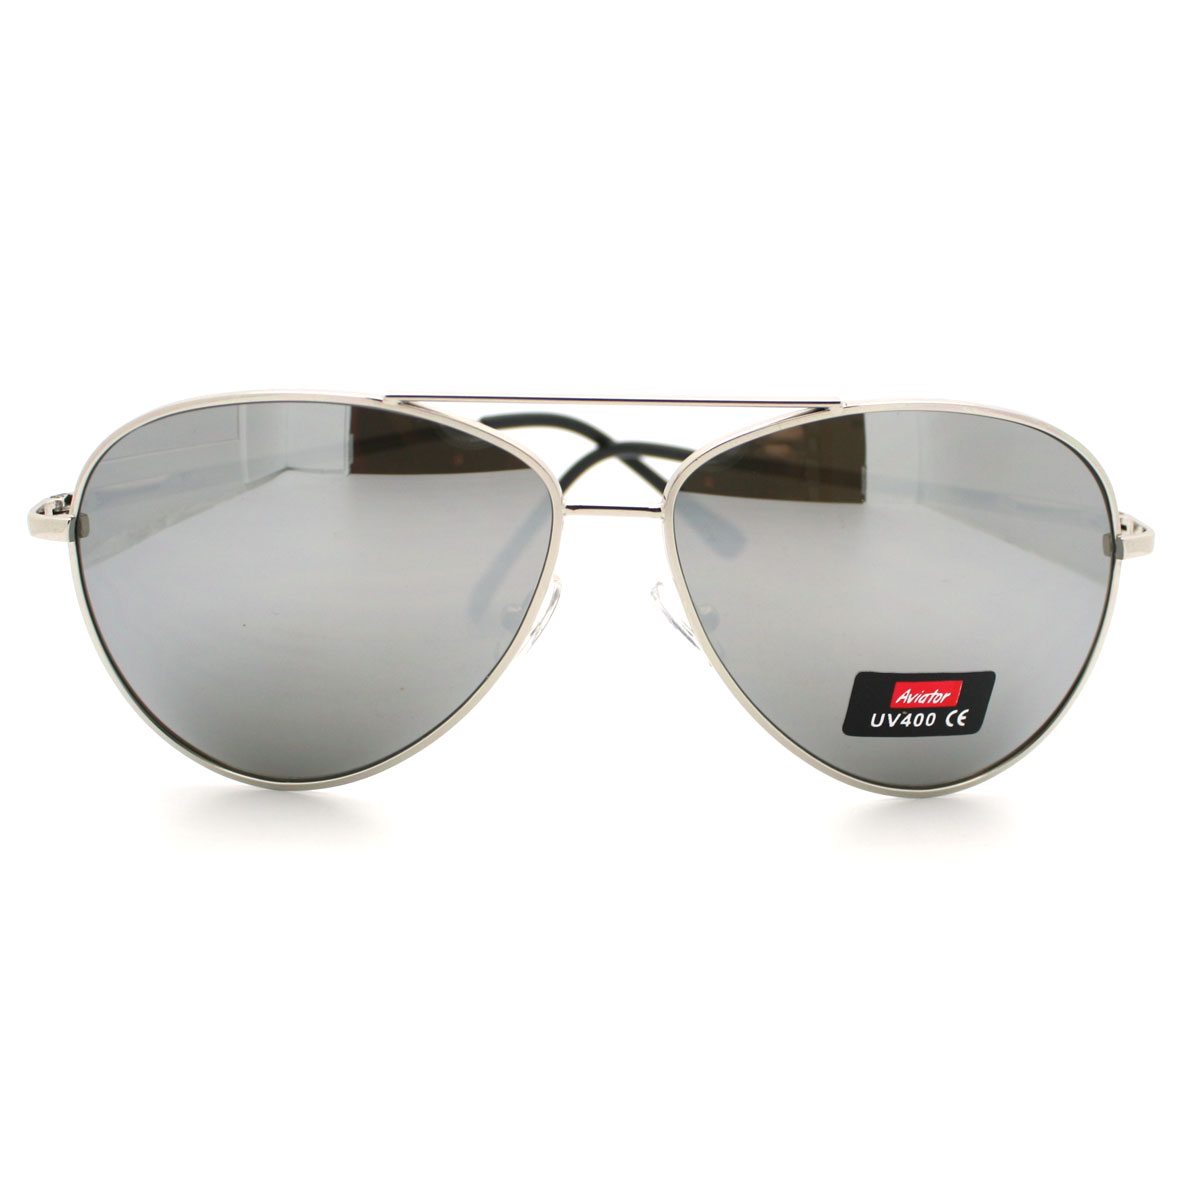 aviator sunglasses silver  Classic Police Style Mirror Lens Aviator Sunglasses w/ Silver ...